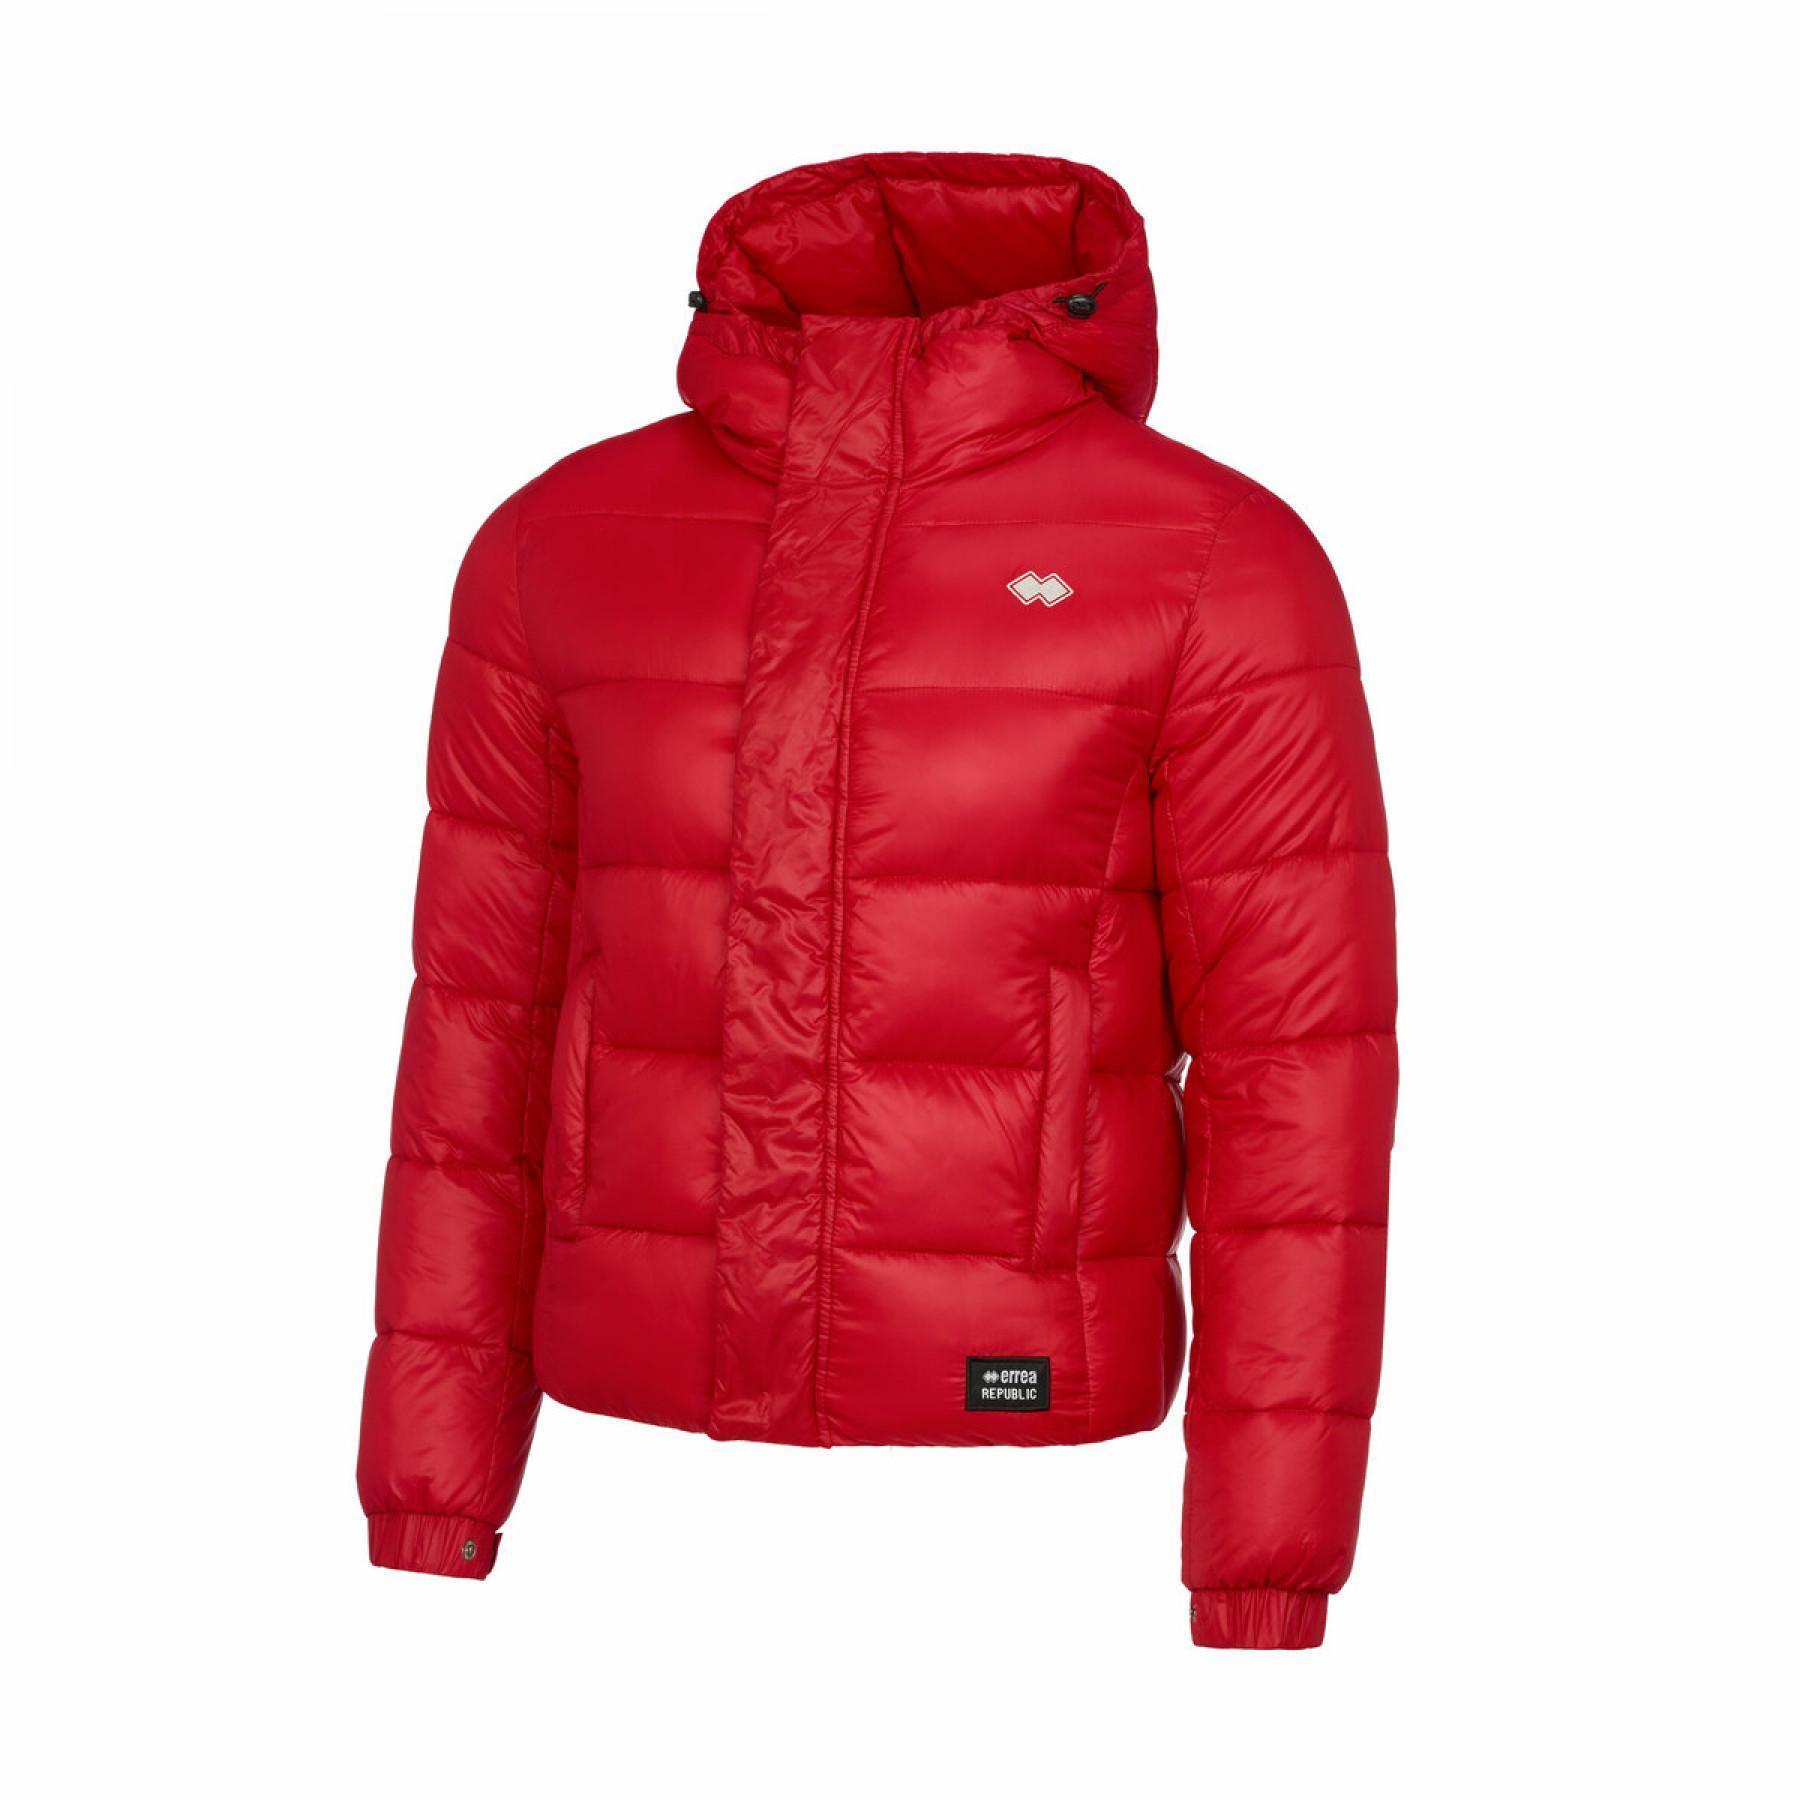 Errea hybrid quilted jacket big logo